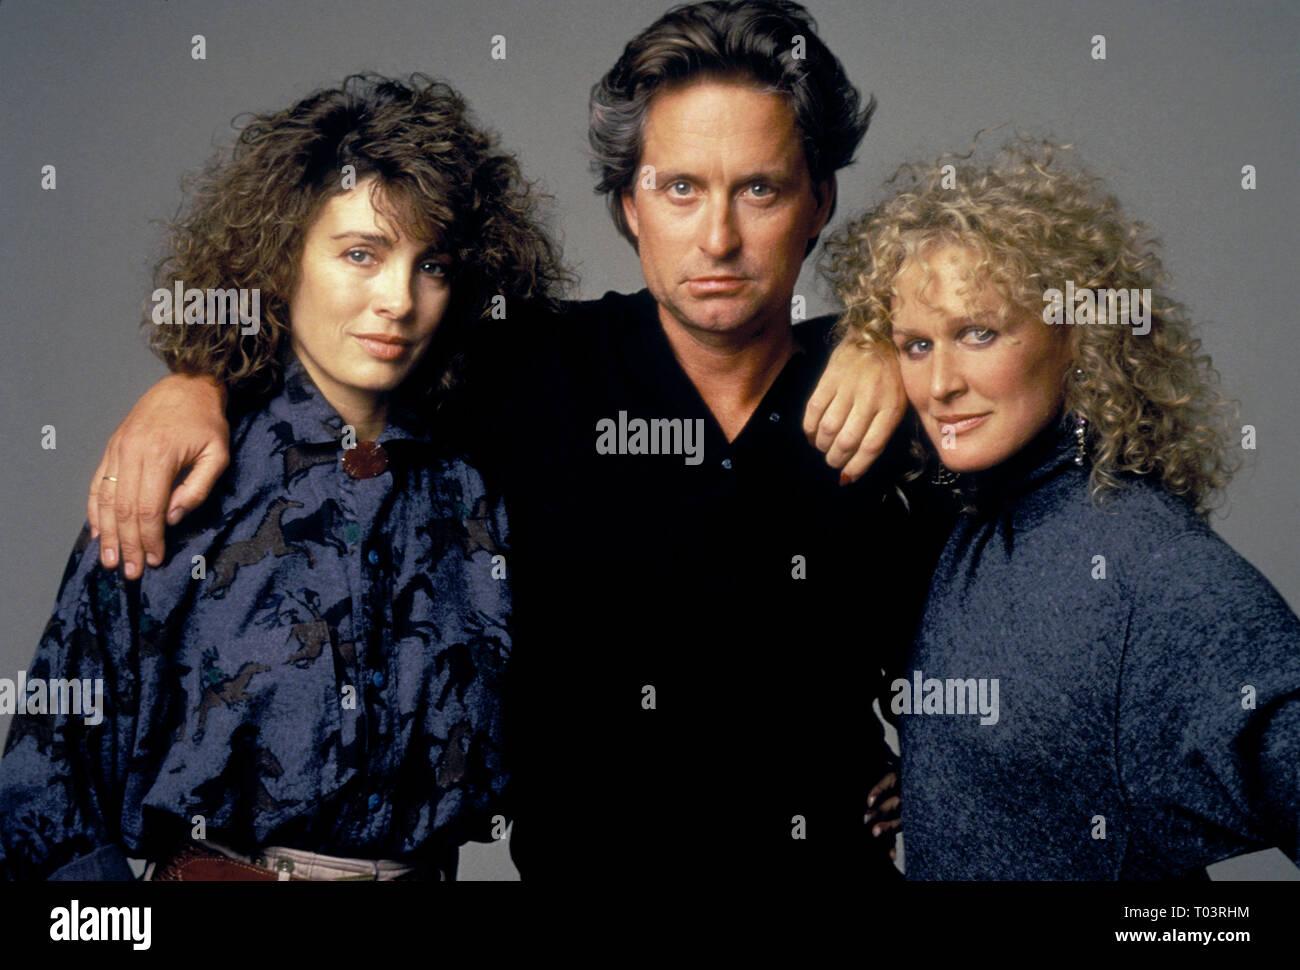 Glenn Close Fatal Attraction Stock Photos & Glenn Close ...